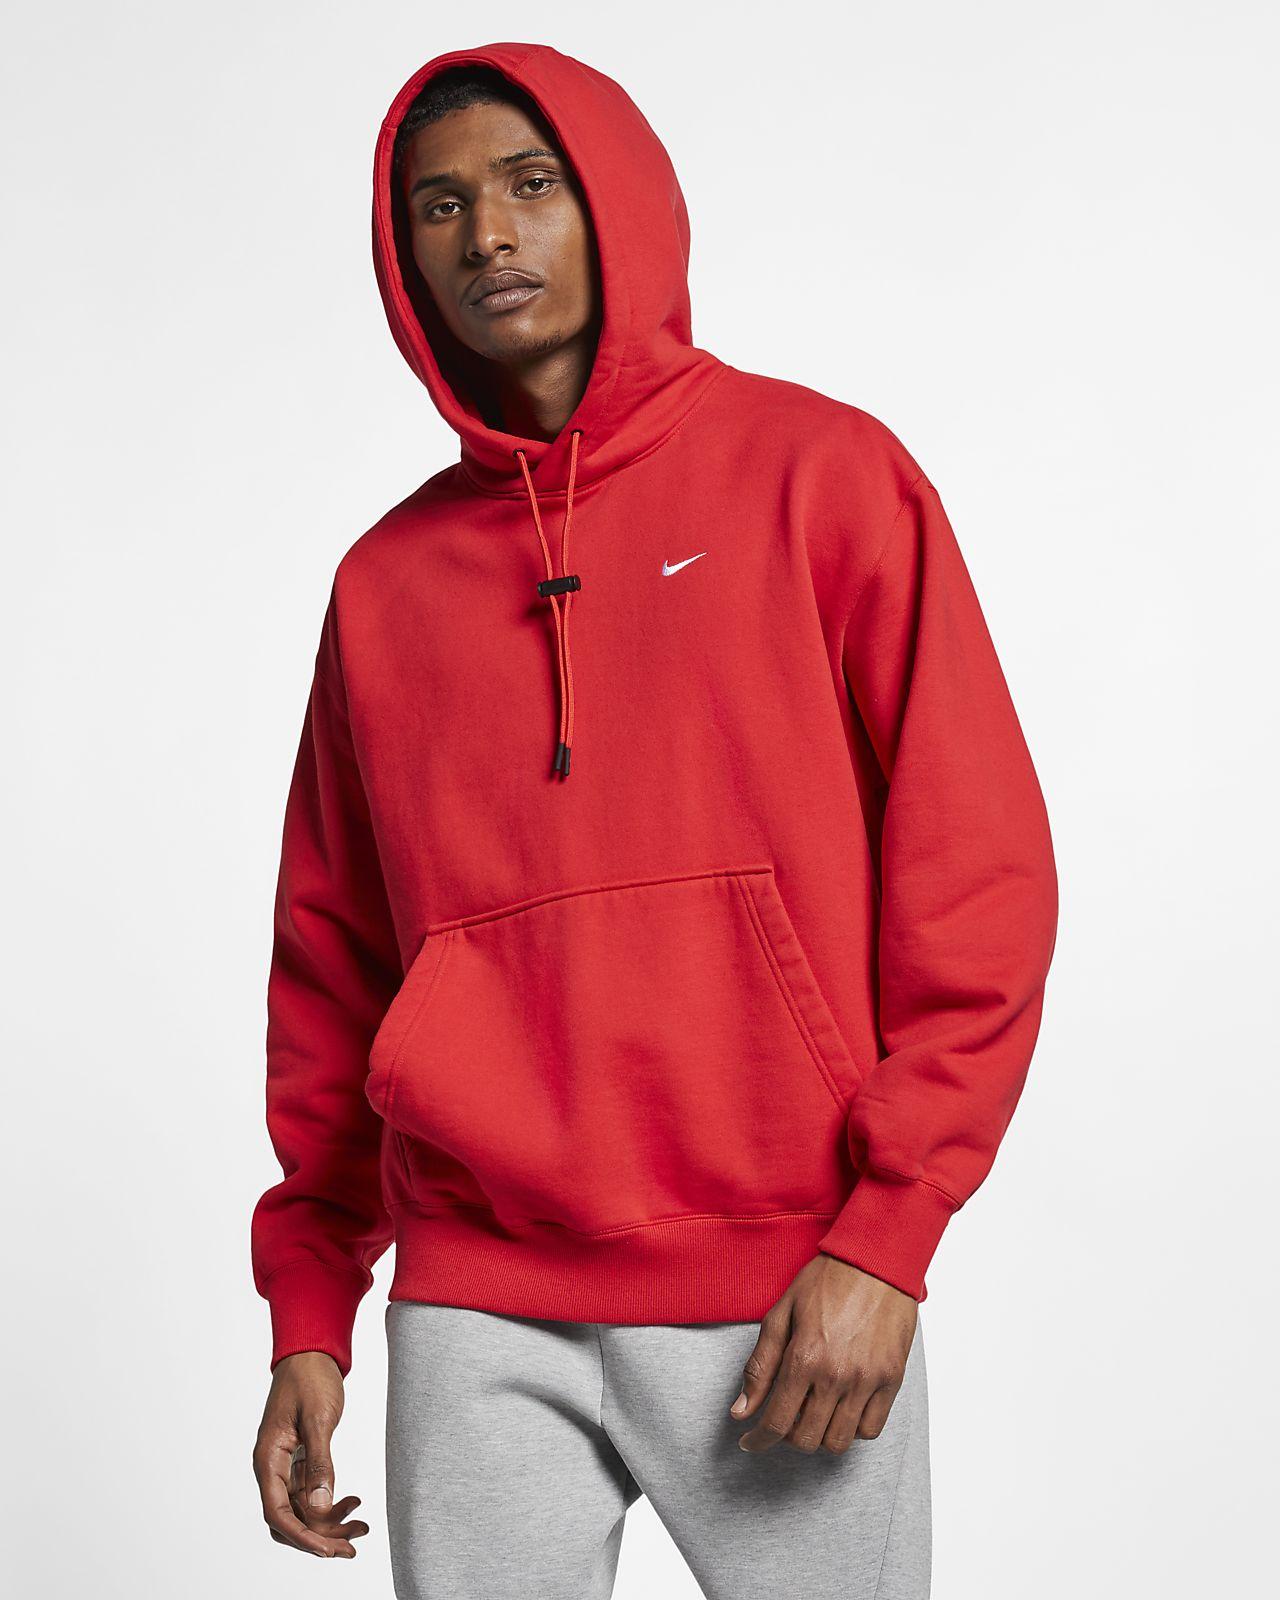 Hoodie pullover NikeLab Collection para homem